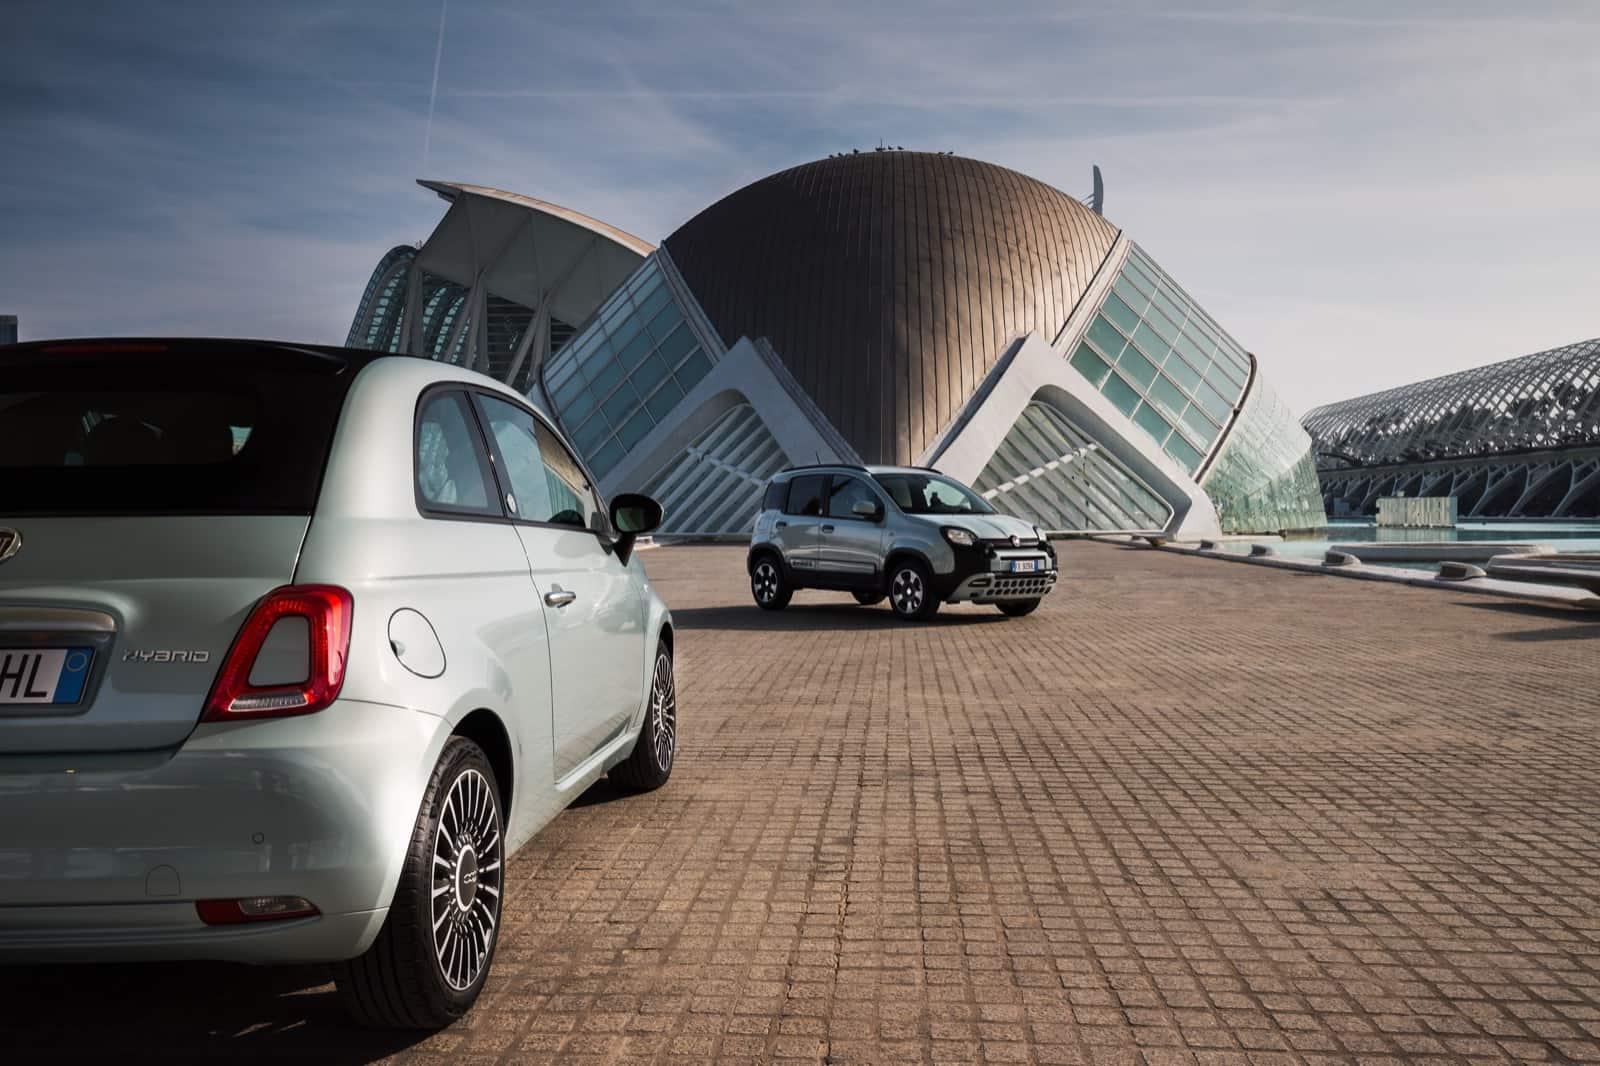 Fiat-500-Panda-Hybrid-Launch-Edition-02